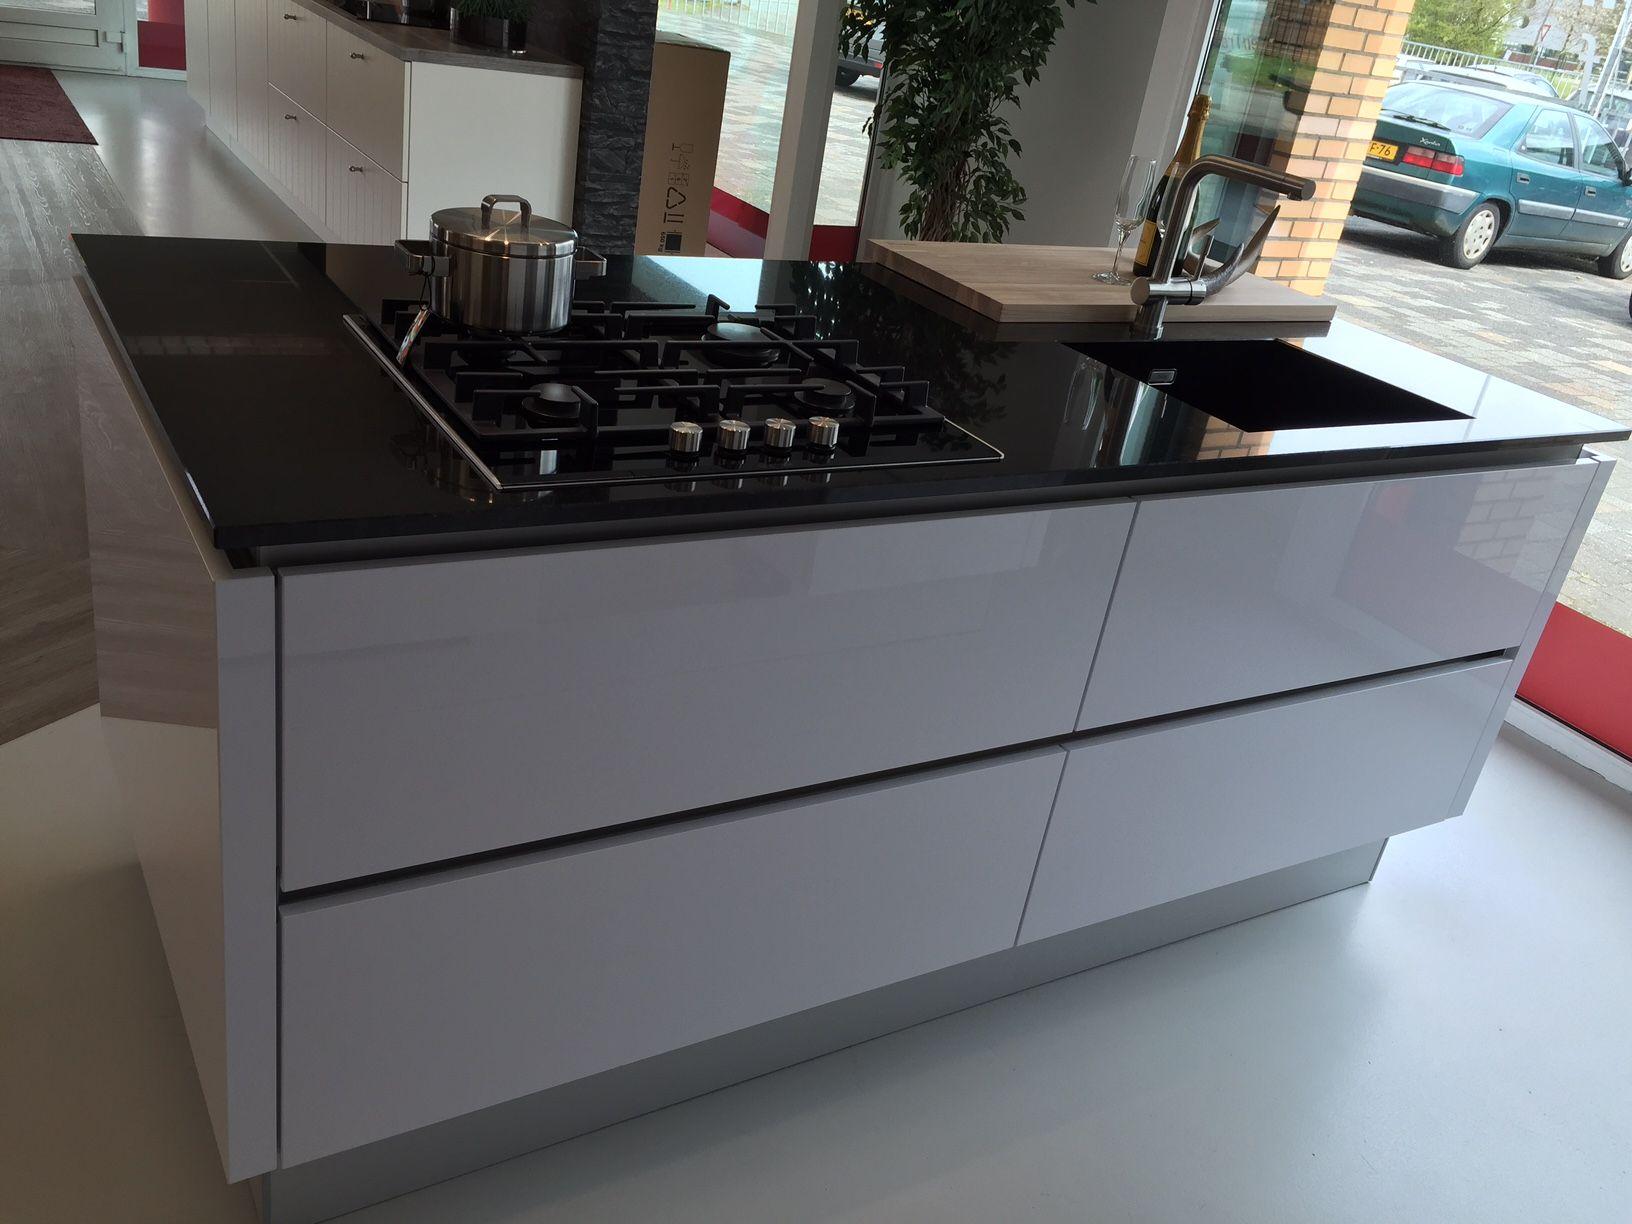 de voordeligste woonwinkel van nederland kt 17 54491. Black Bedroom Furniture Sets. Home Design Ideas